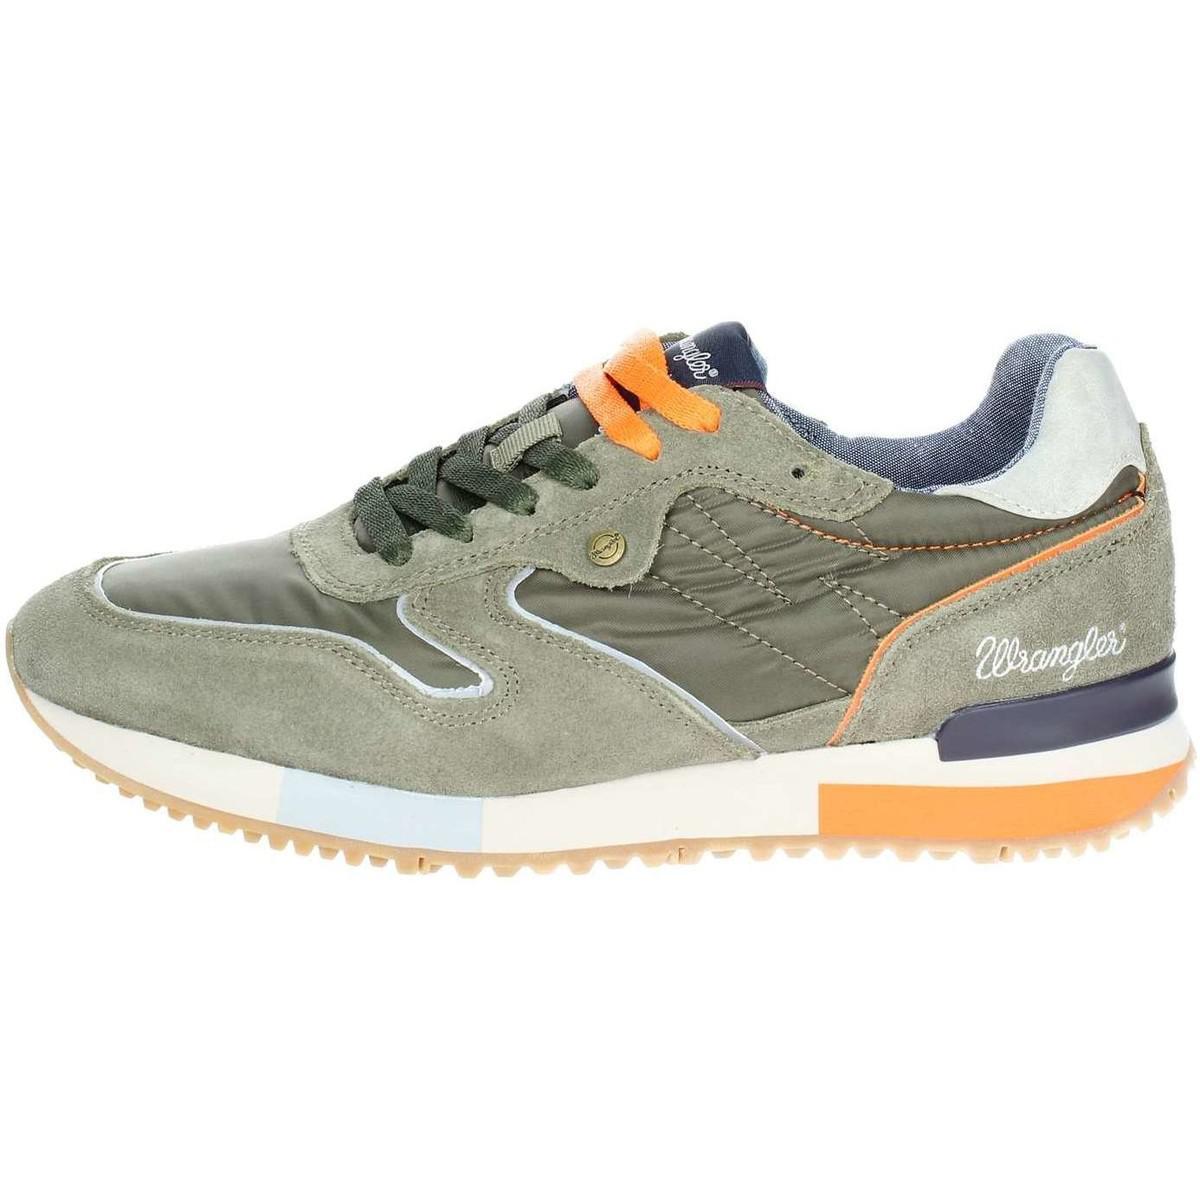 Wrangler Wm181081 Men's Shoes (trainers